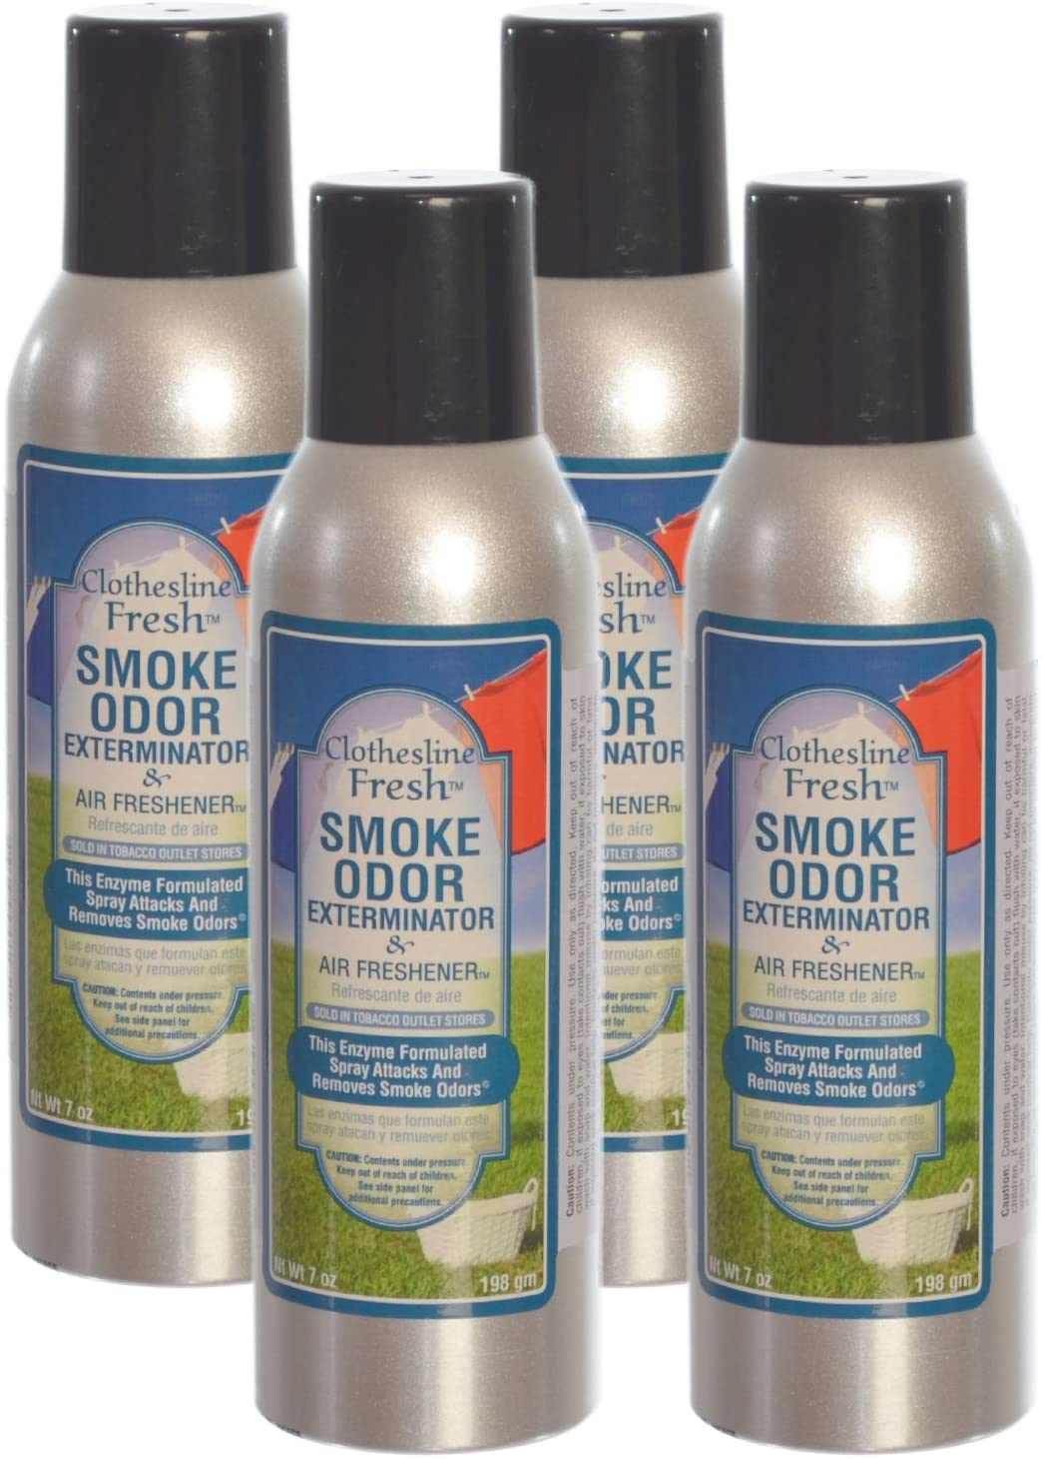 Smoke Odor Exterminator Removes Cigar/Cigarette/Pipe/Tobacco Smells 7oz Spray Air Freshener, Clothesline Fresh (4-Pack)